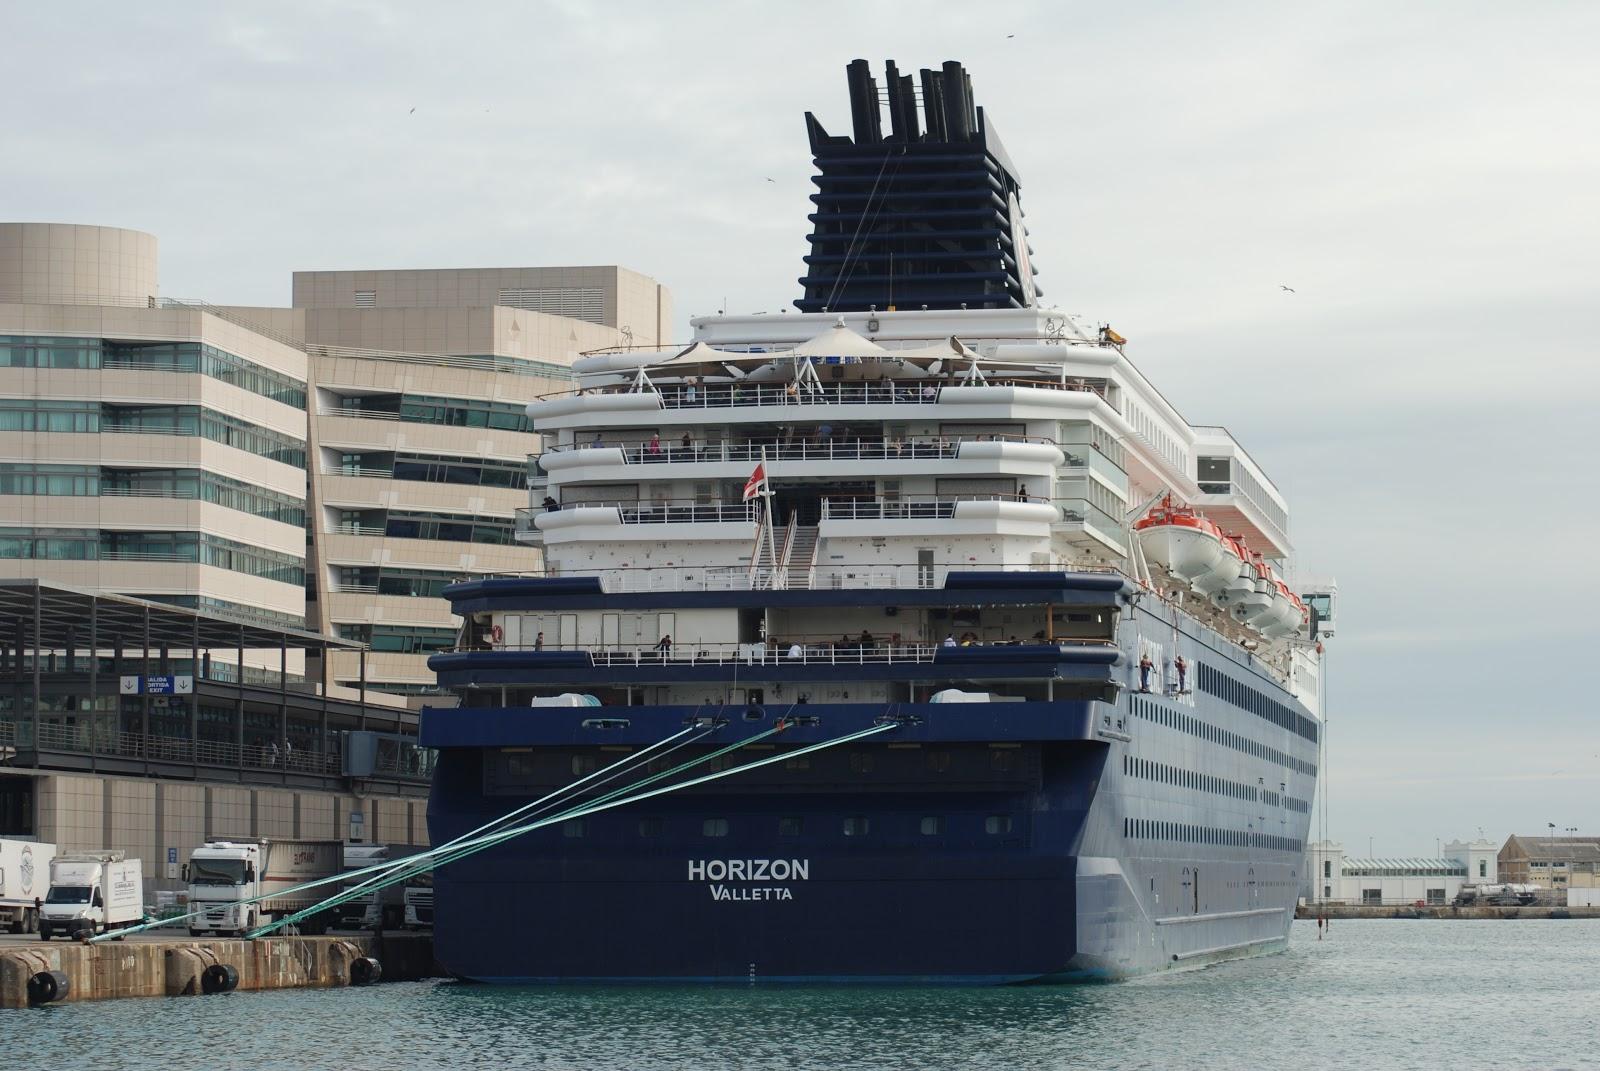 NAVIGATIONCruising And Maritime Themes Cruise Ship